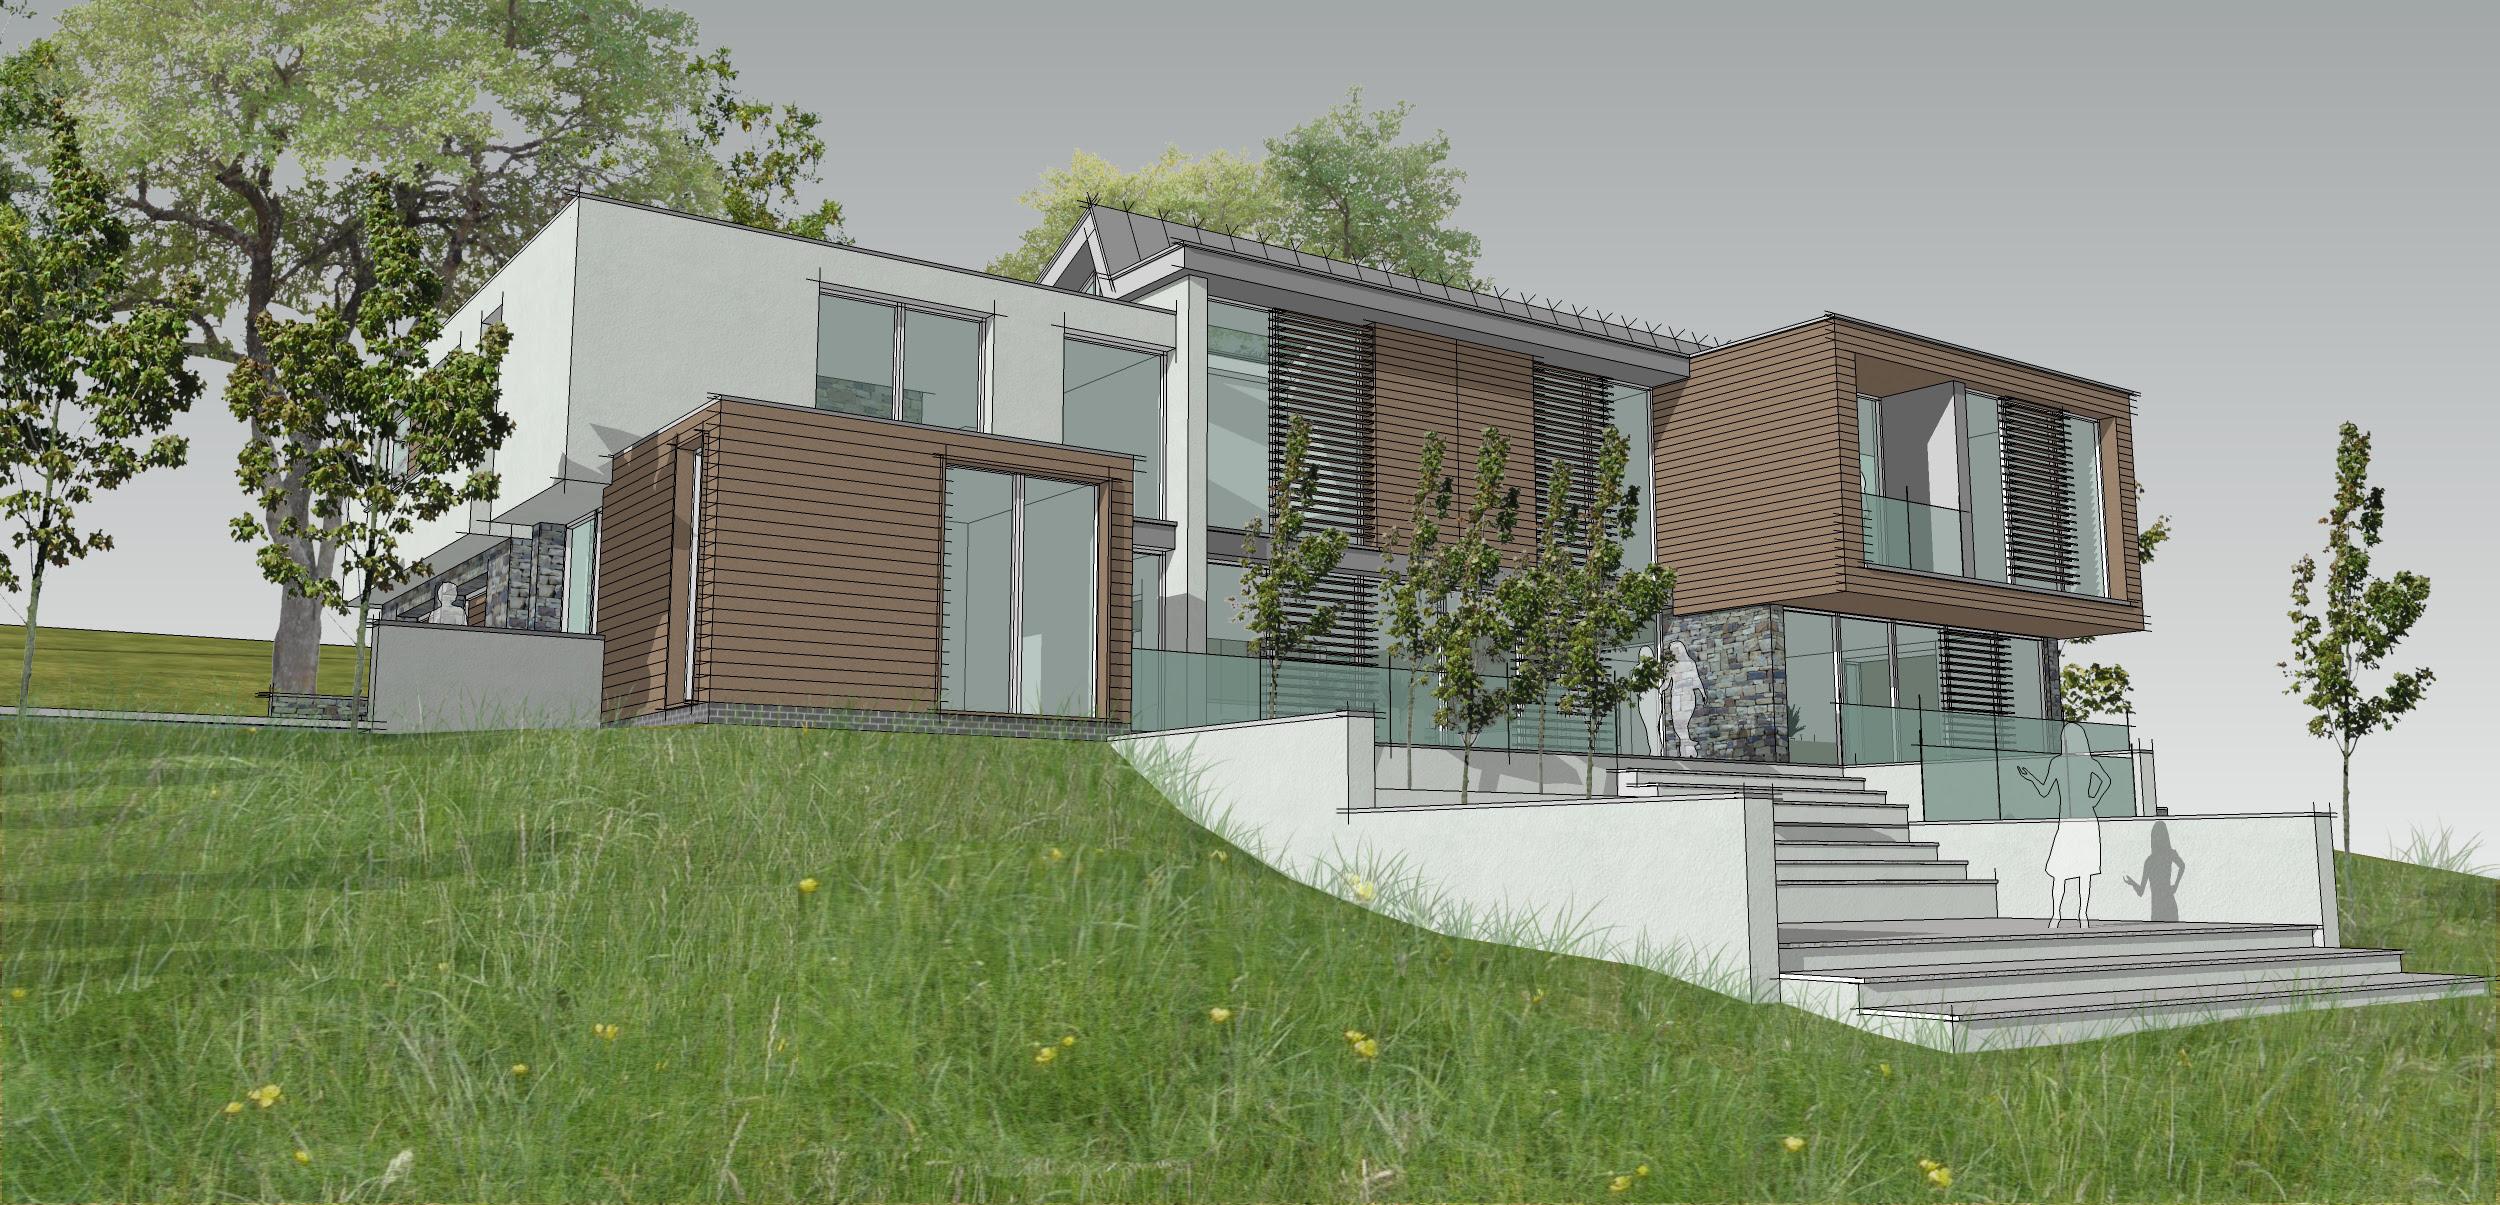 Contemporary house design progresses through feasibility